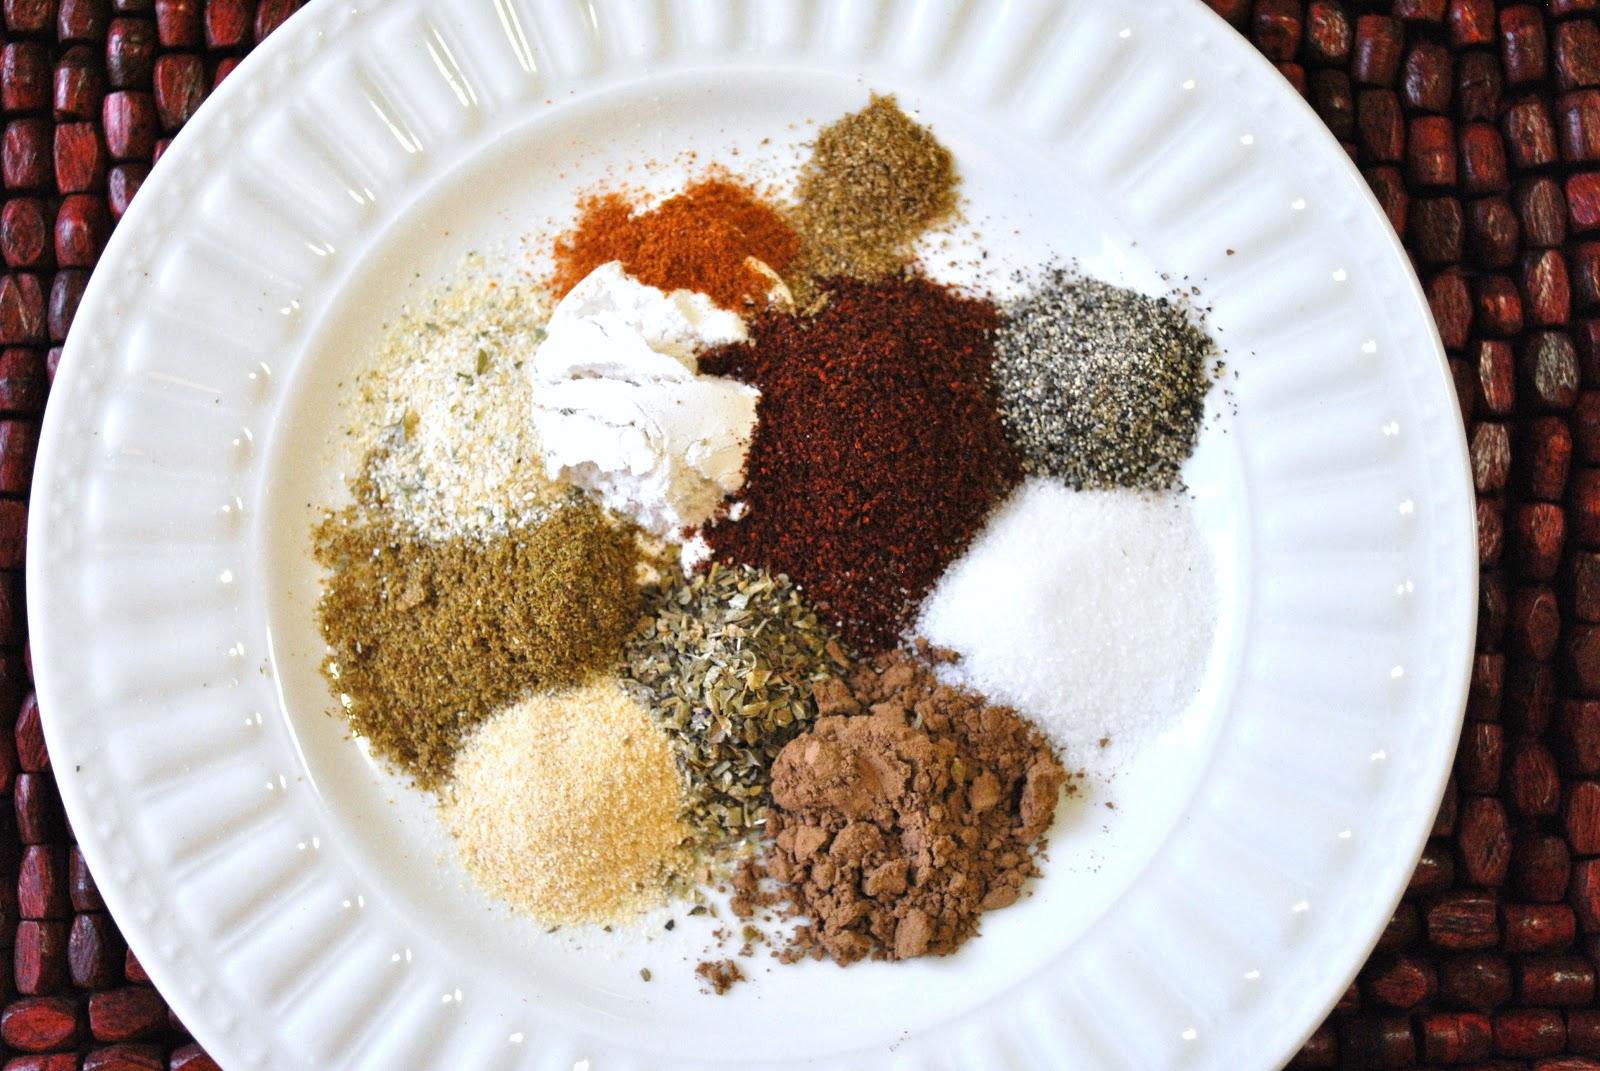 ... dip or dressing taco seasoning ii recipe homemade chili taco seasoning